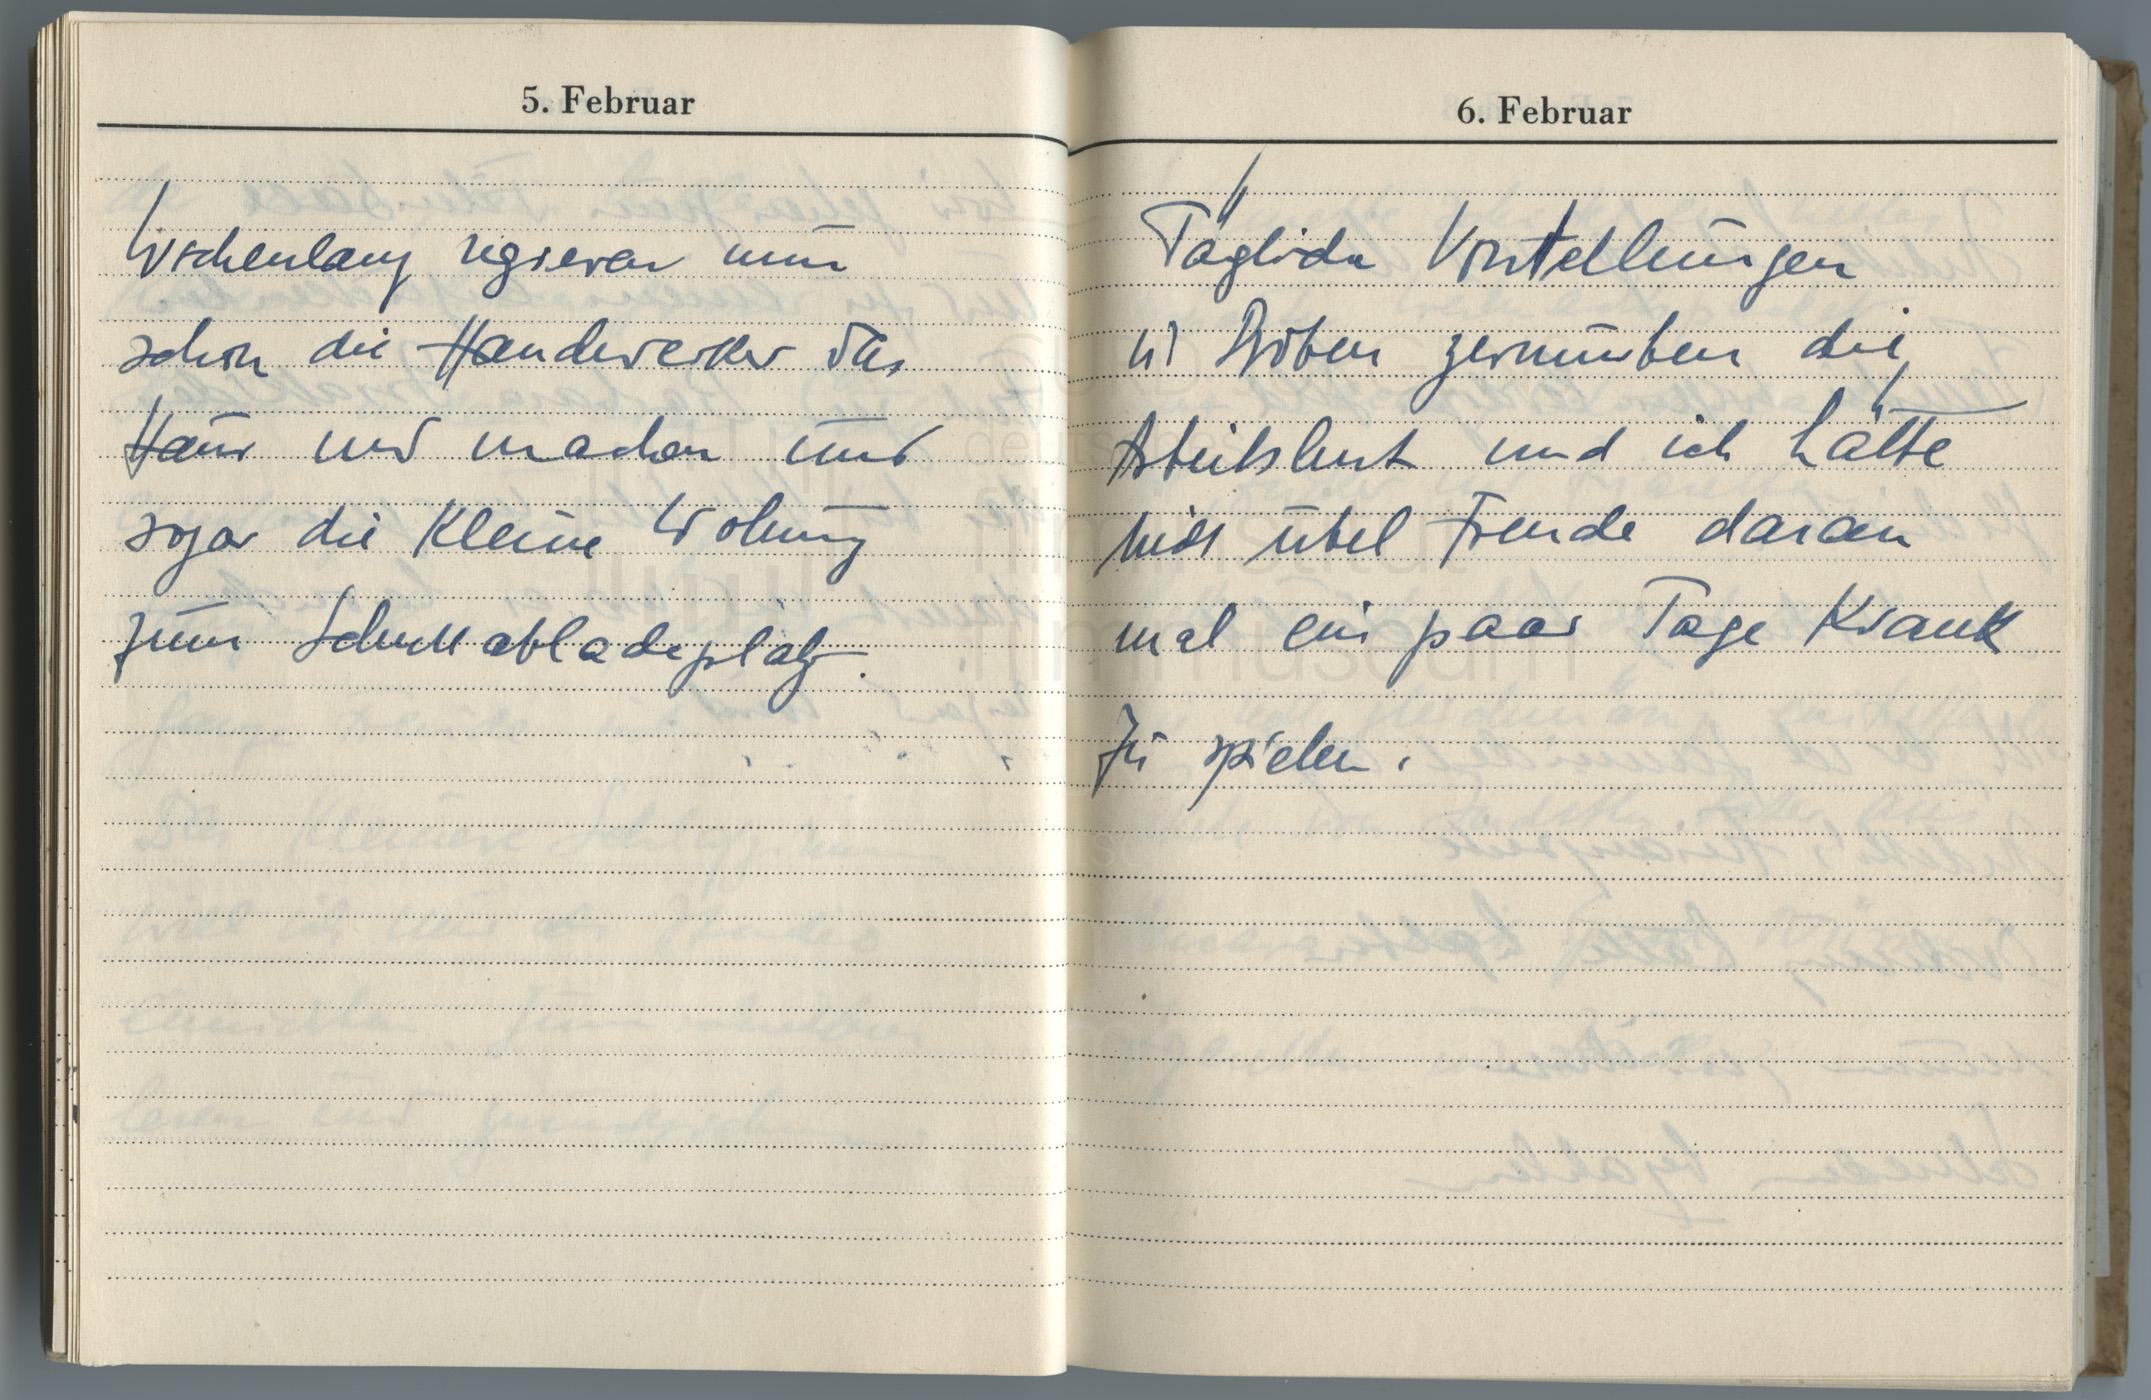 Tagebucheintrag vom 6.2.1947